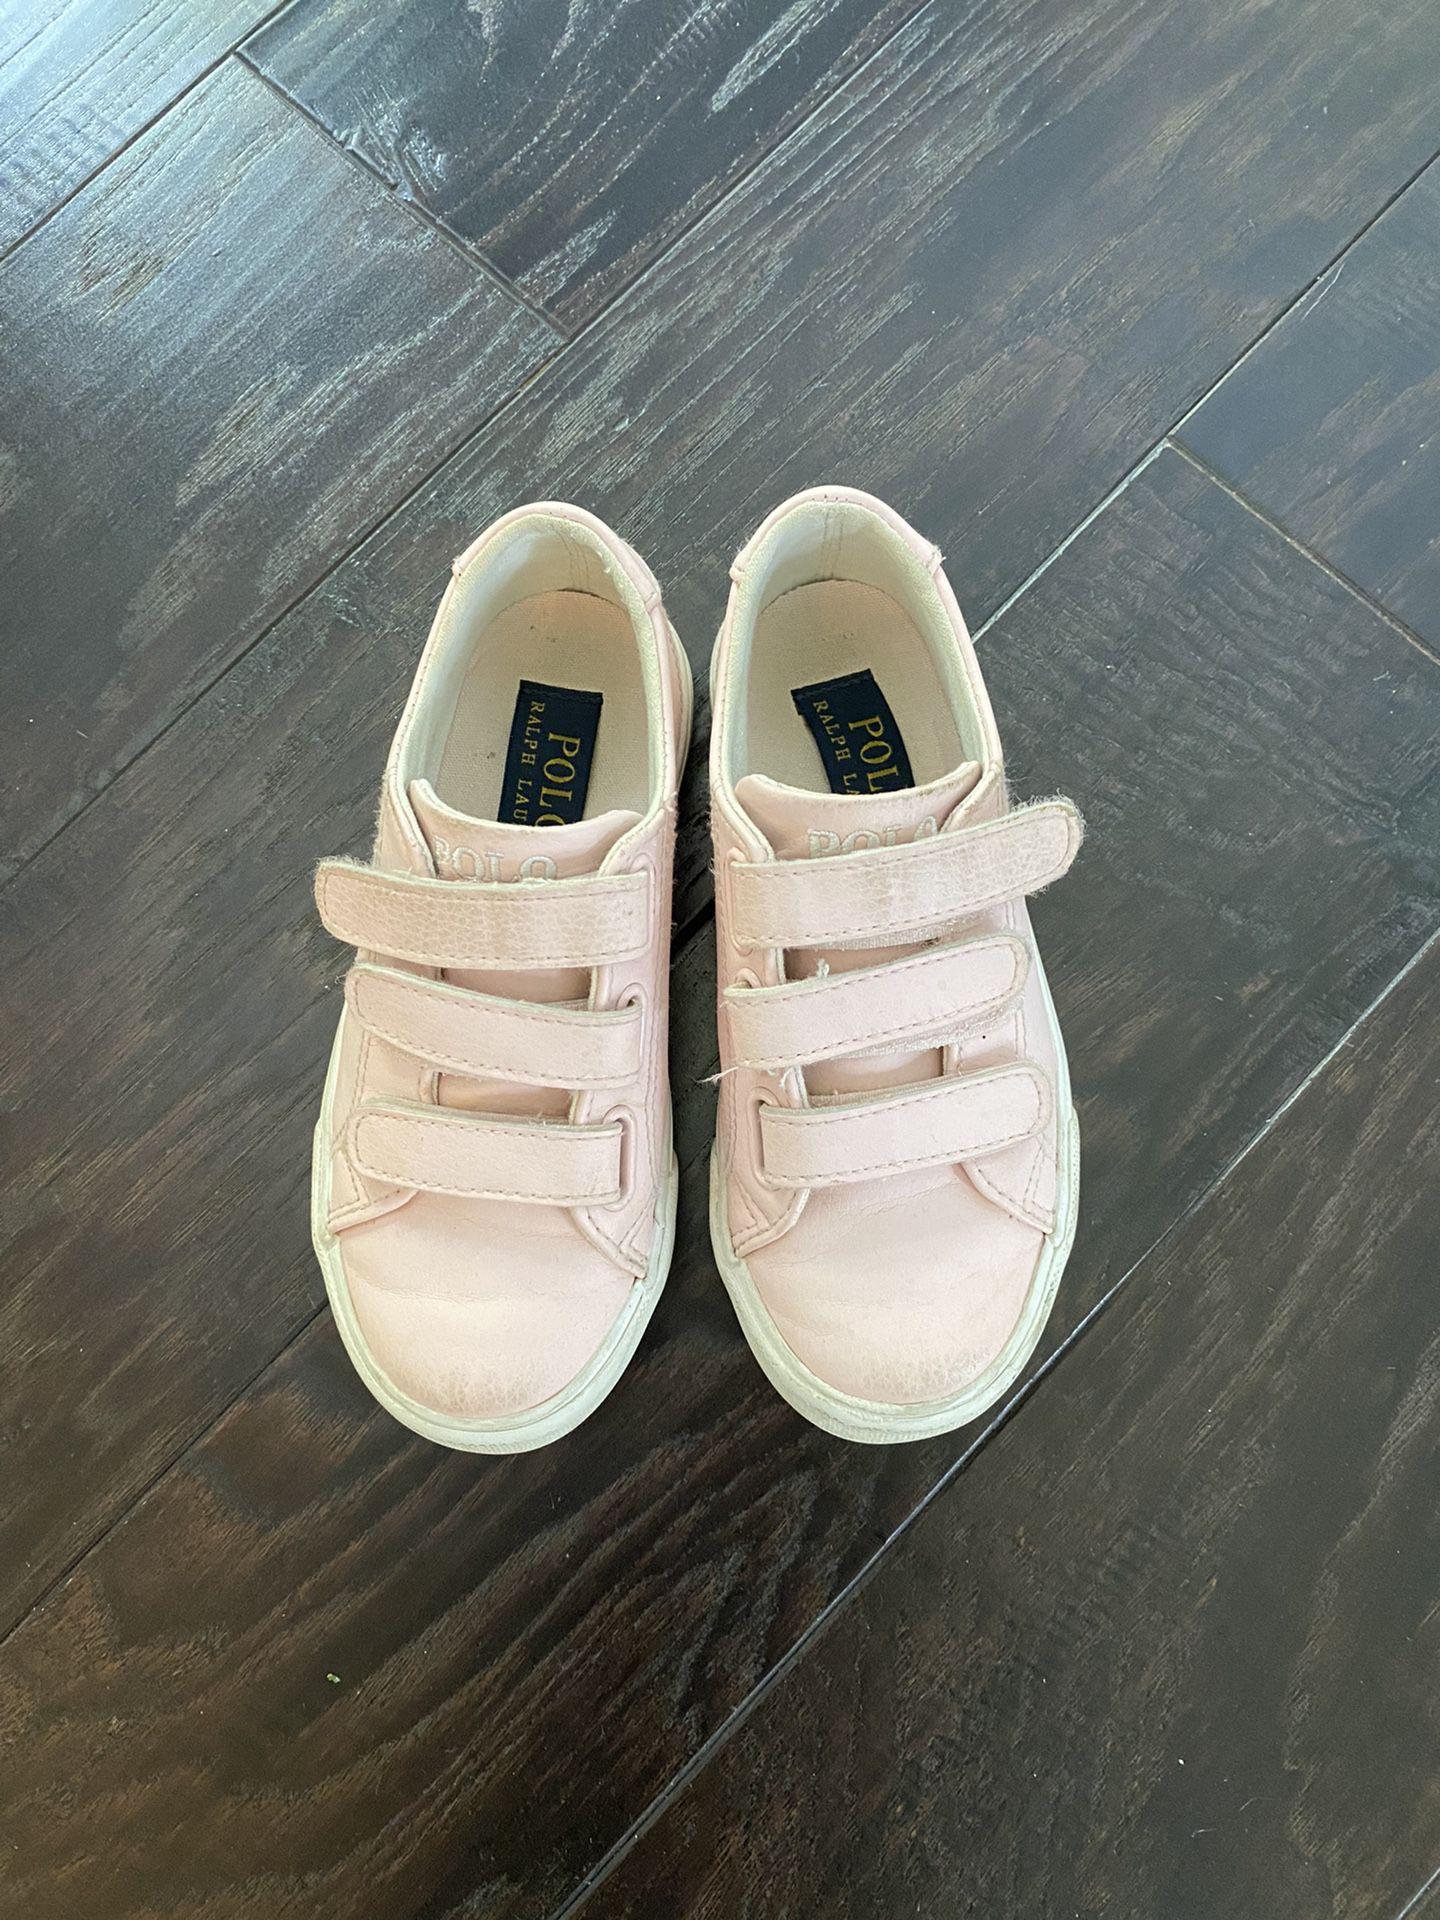 Polo Ralph Lauren (Size 11 Kids) 7$